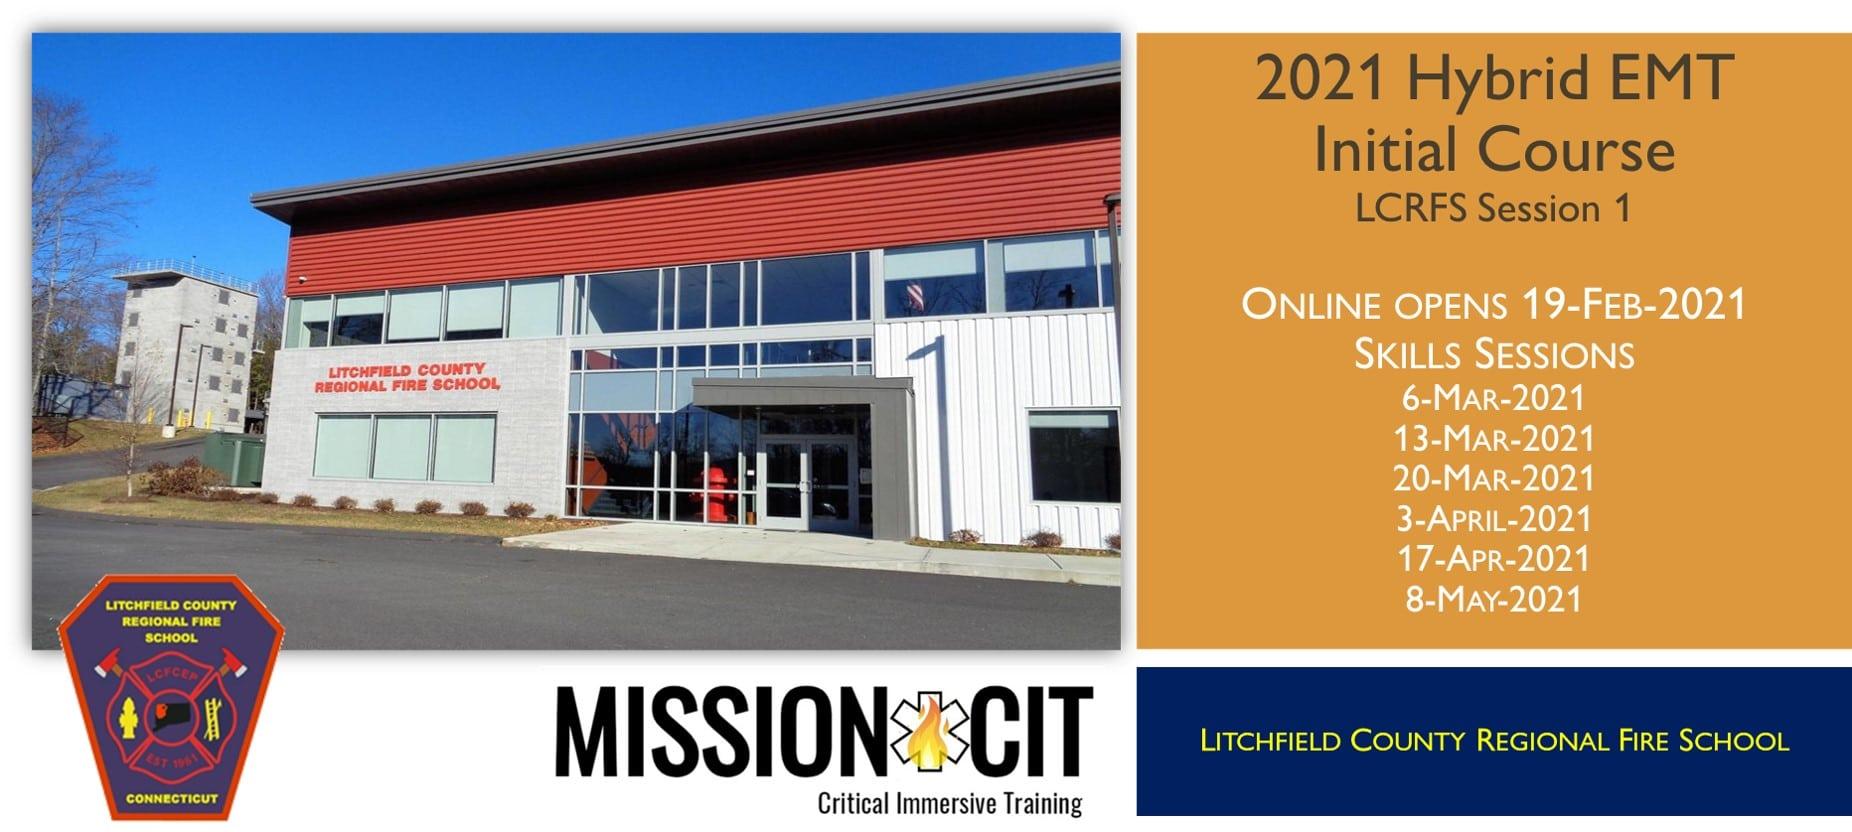 2021 Hybrid EMT Initial Course   LCRFS Session 1